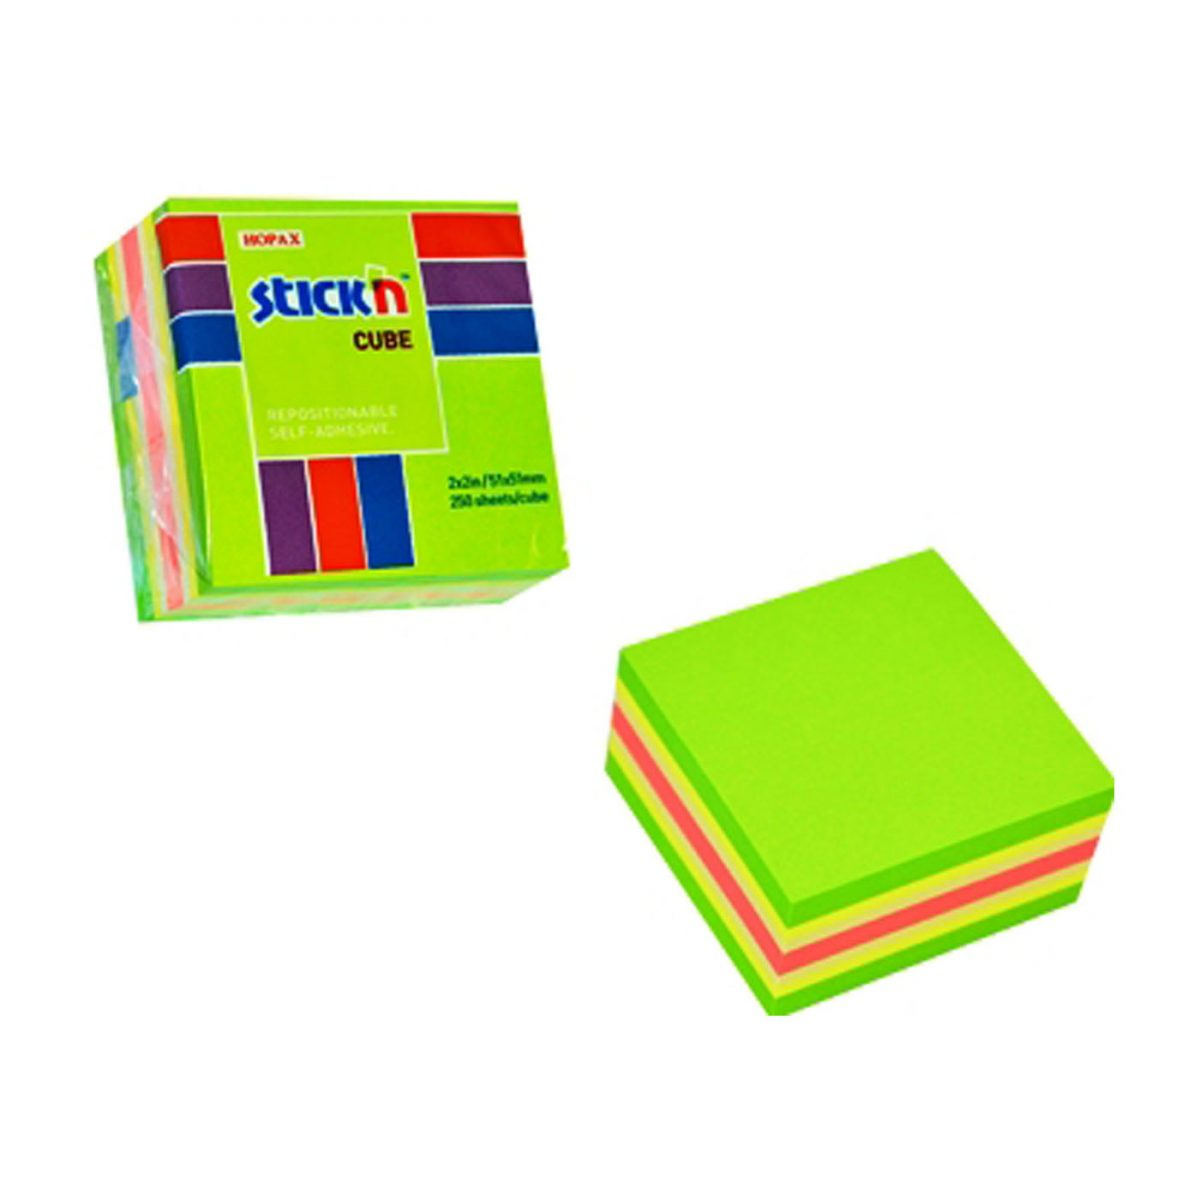 "Cub notes autoadeziv 51 x 51 mm, 250 file, Stick""n - verde"